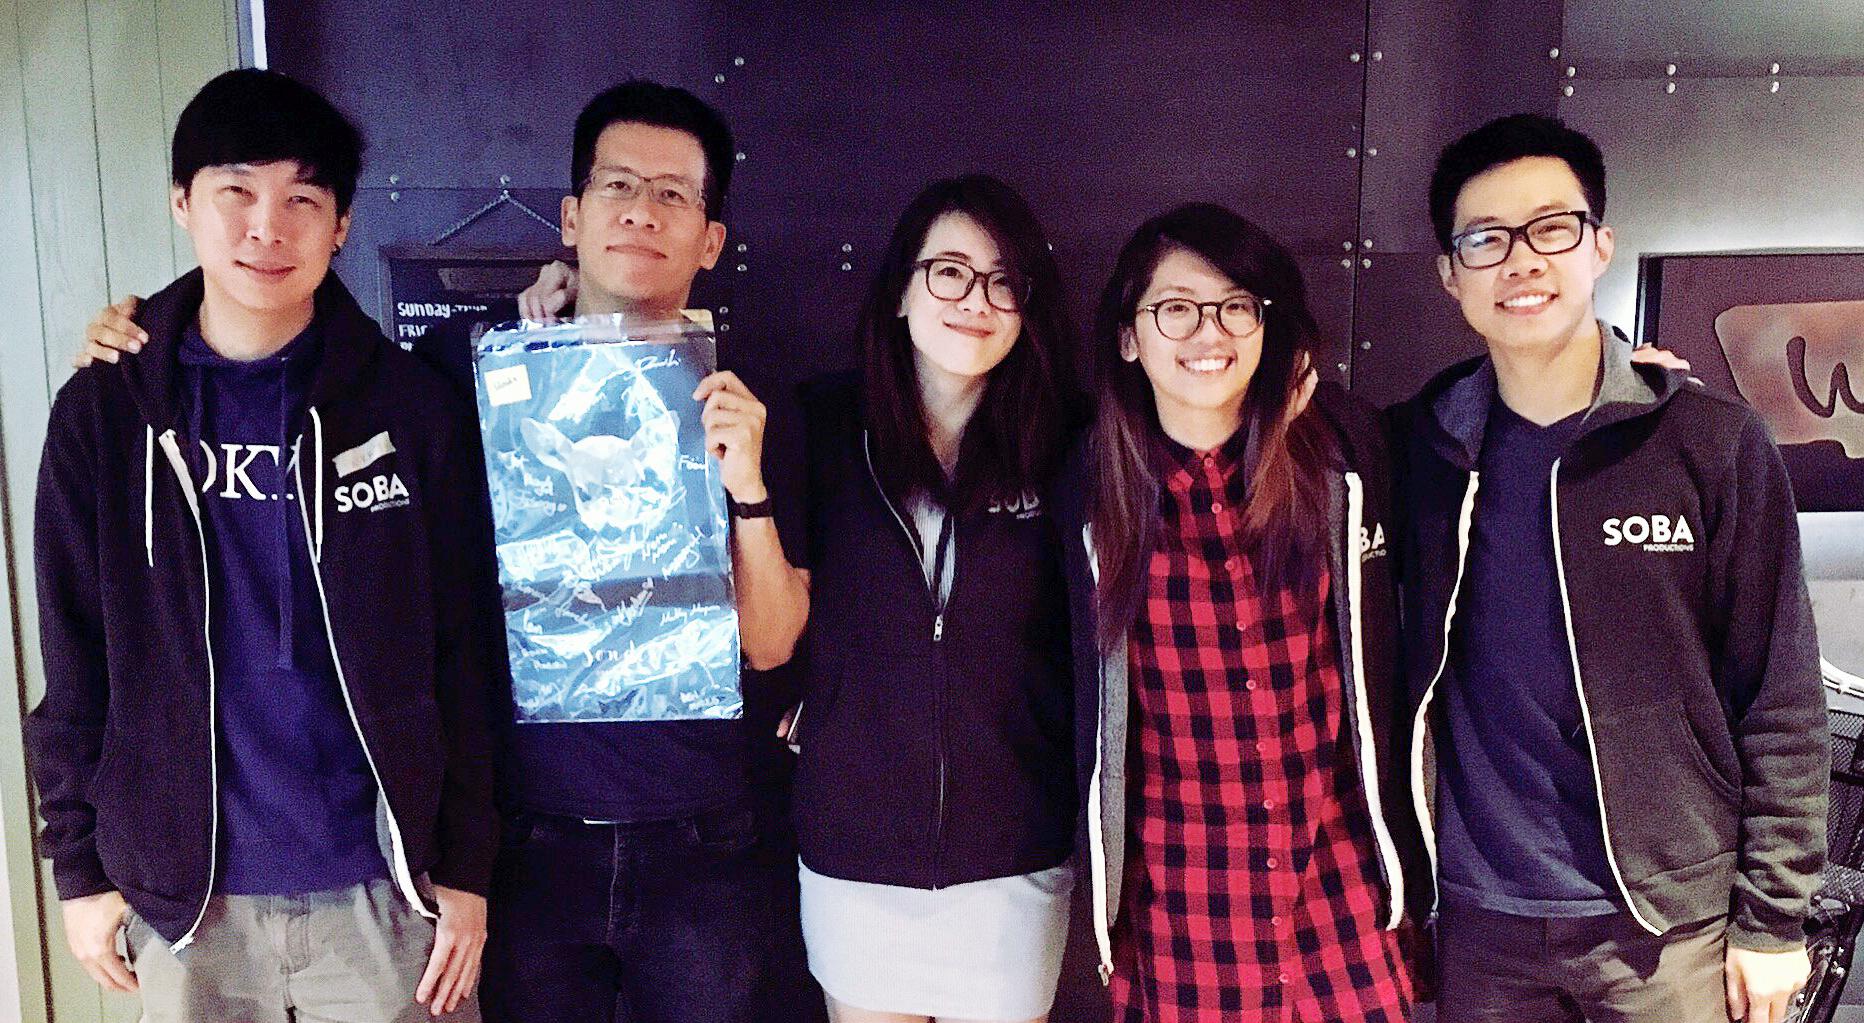 Names from left to right:Nicholas Quek,Bay Gann Boon,Ching Yee (Honda), Yee Sum Hoi, and Julian Teo